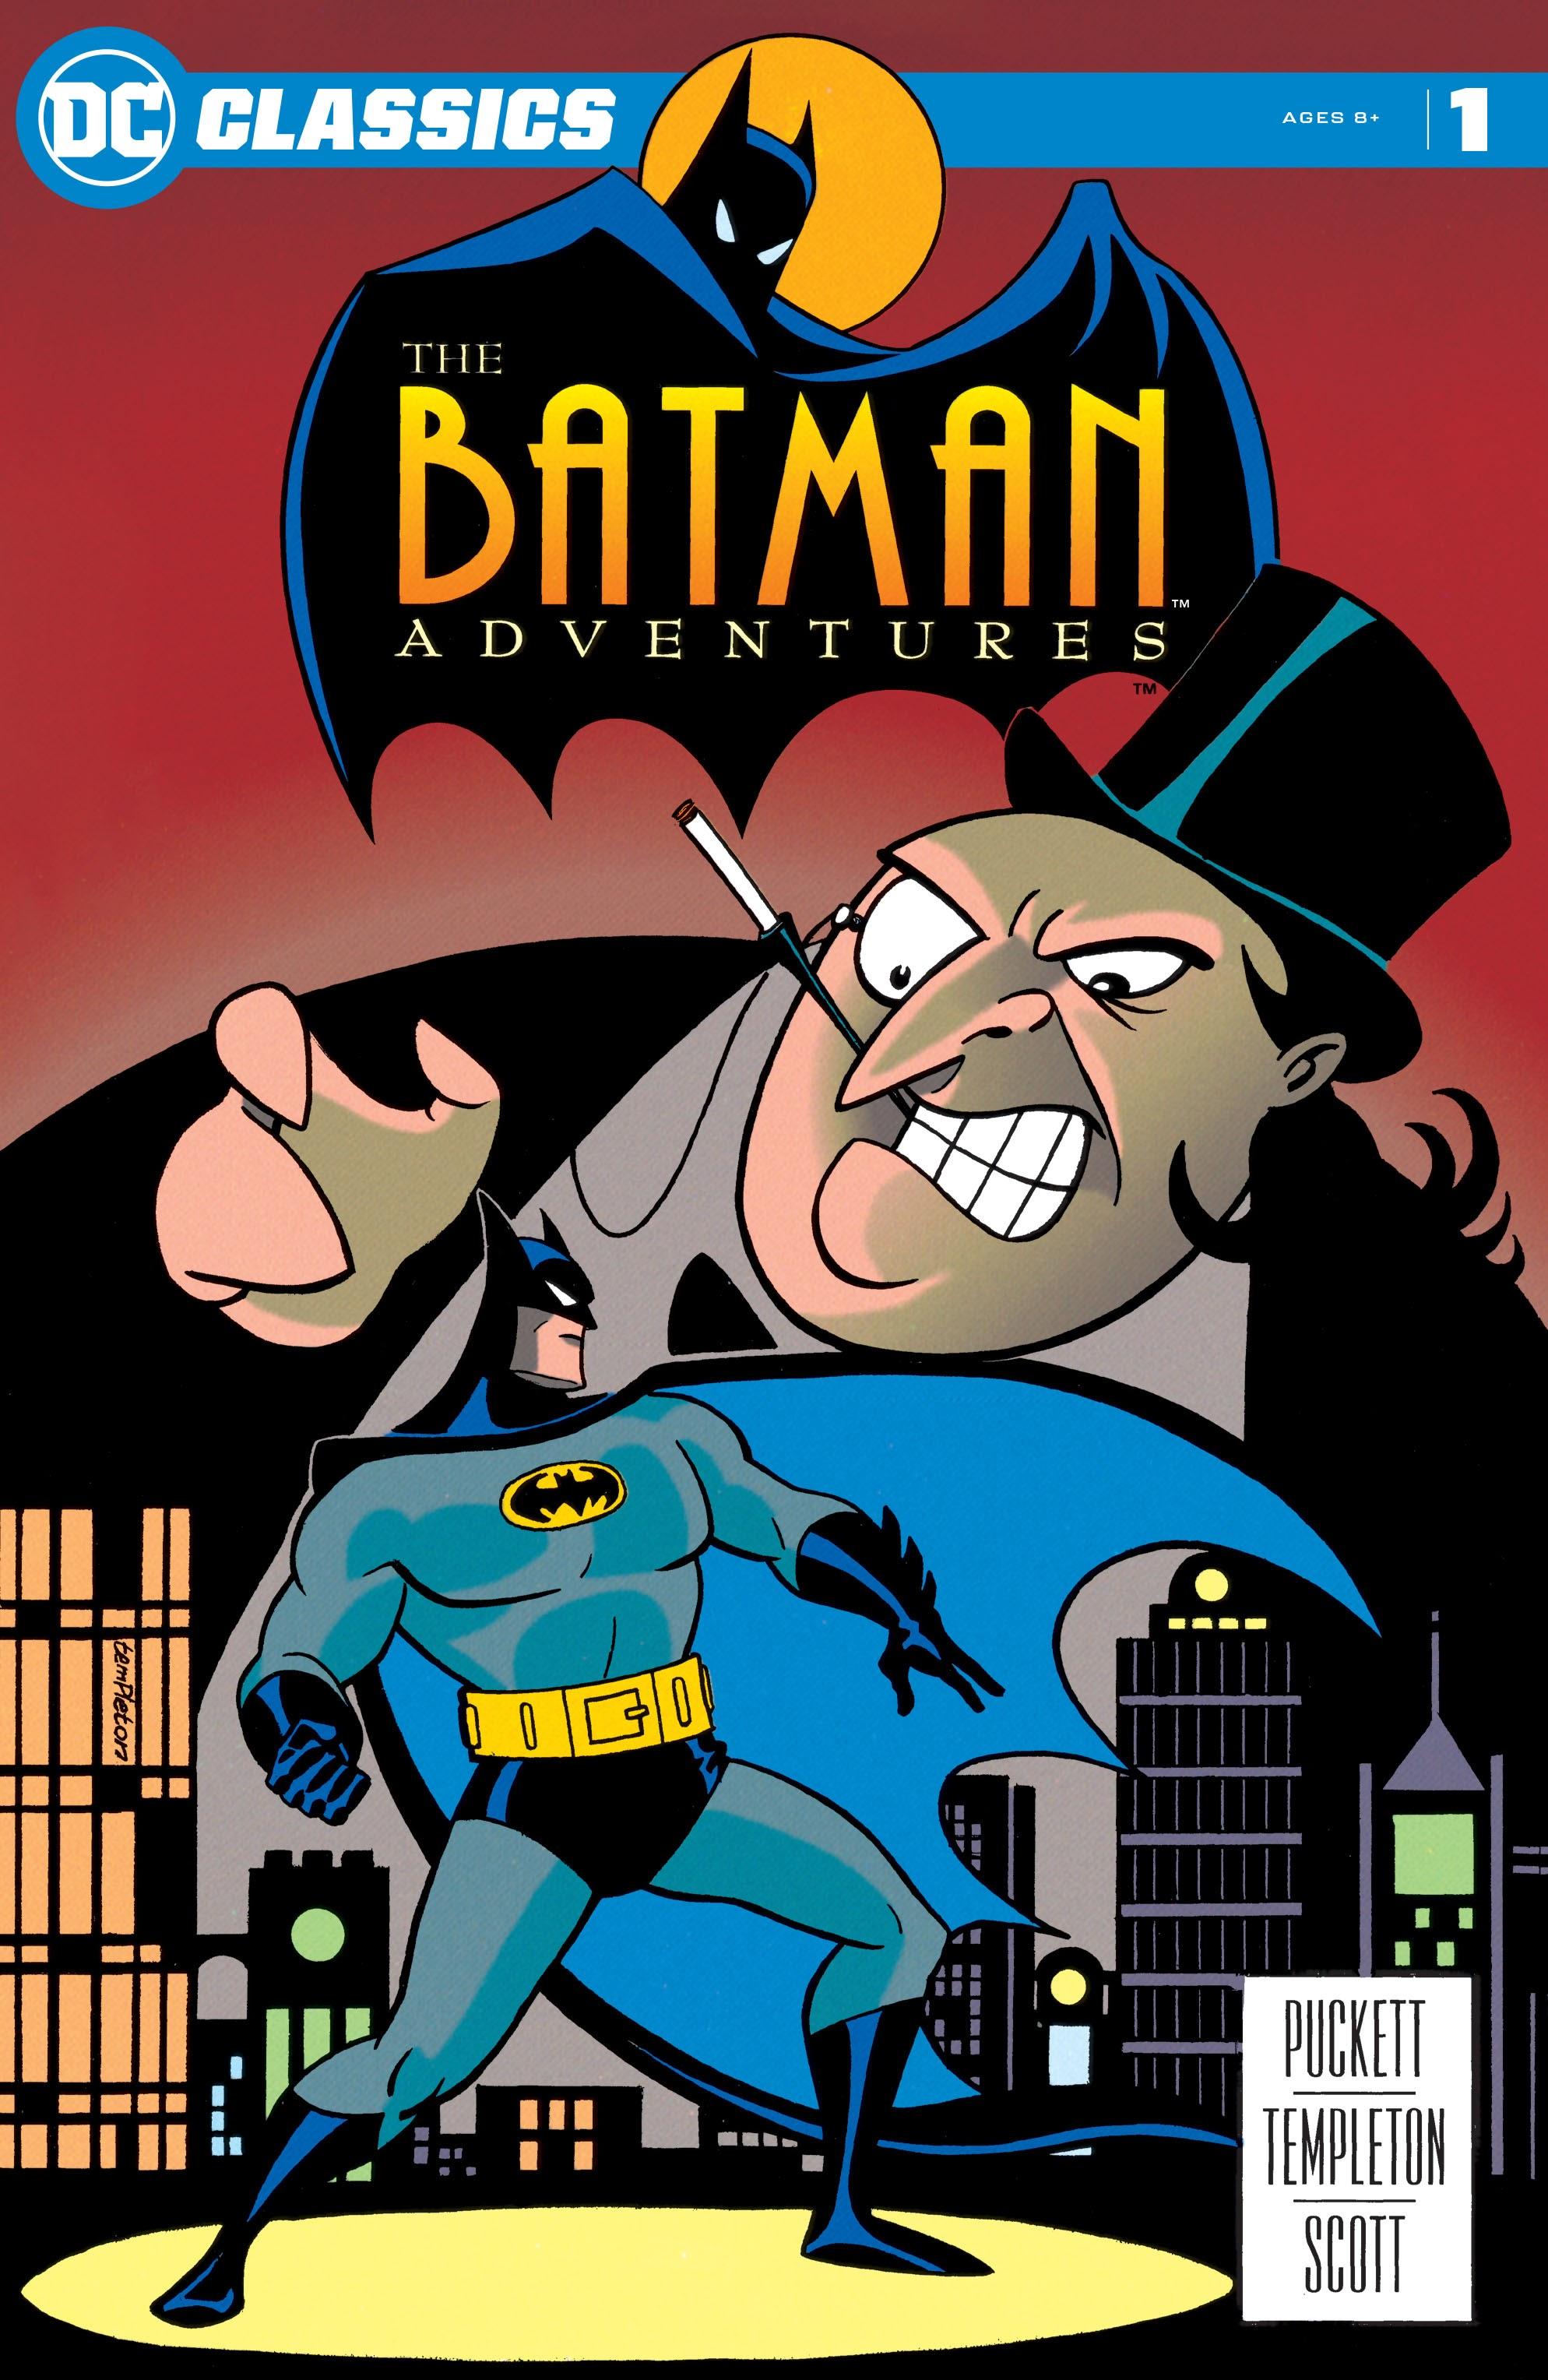 DC Classics: The Batman Adventures Full Page 1